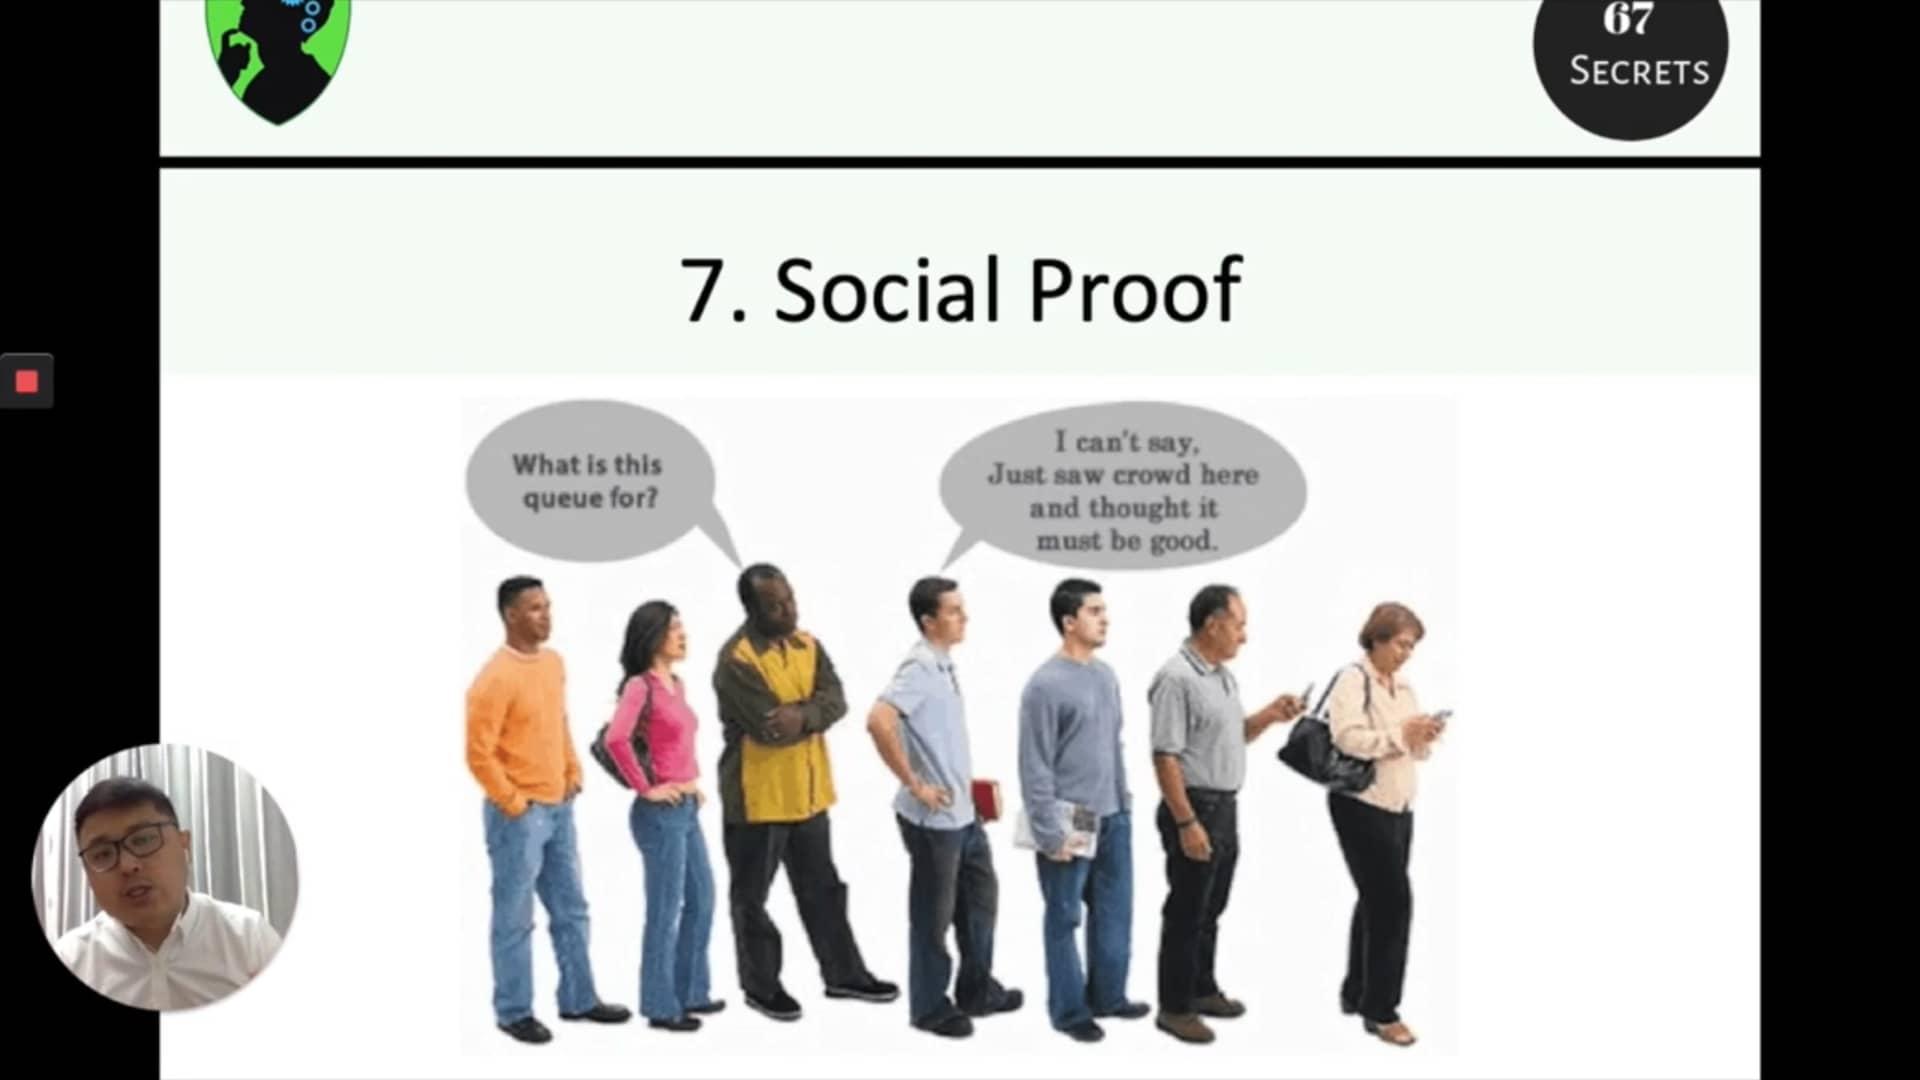 7. Social proof